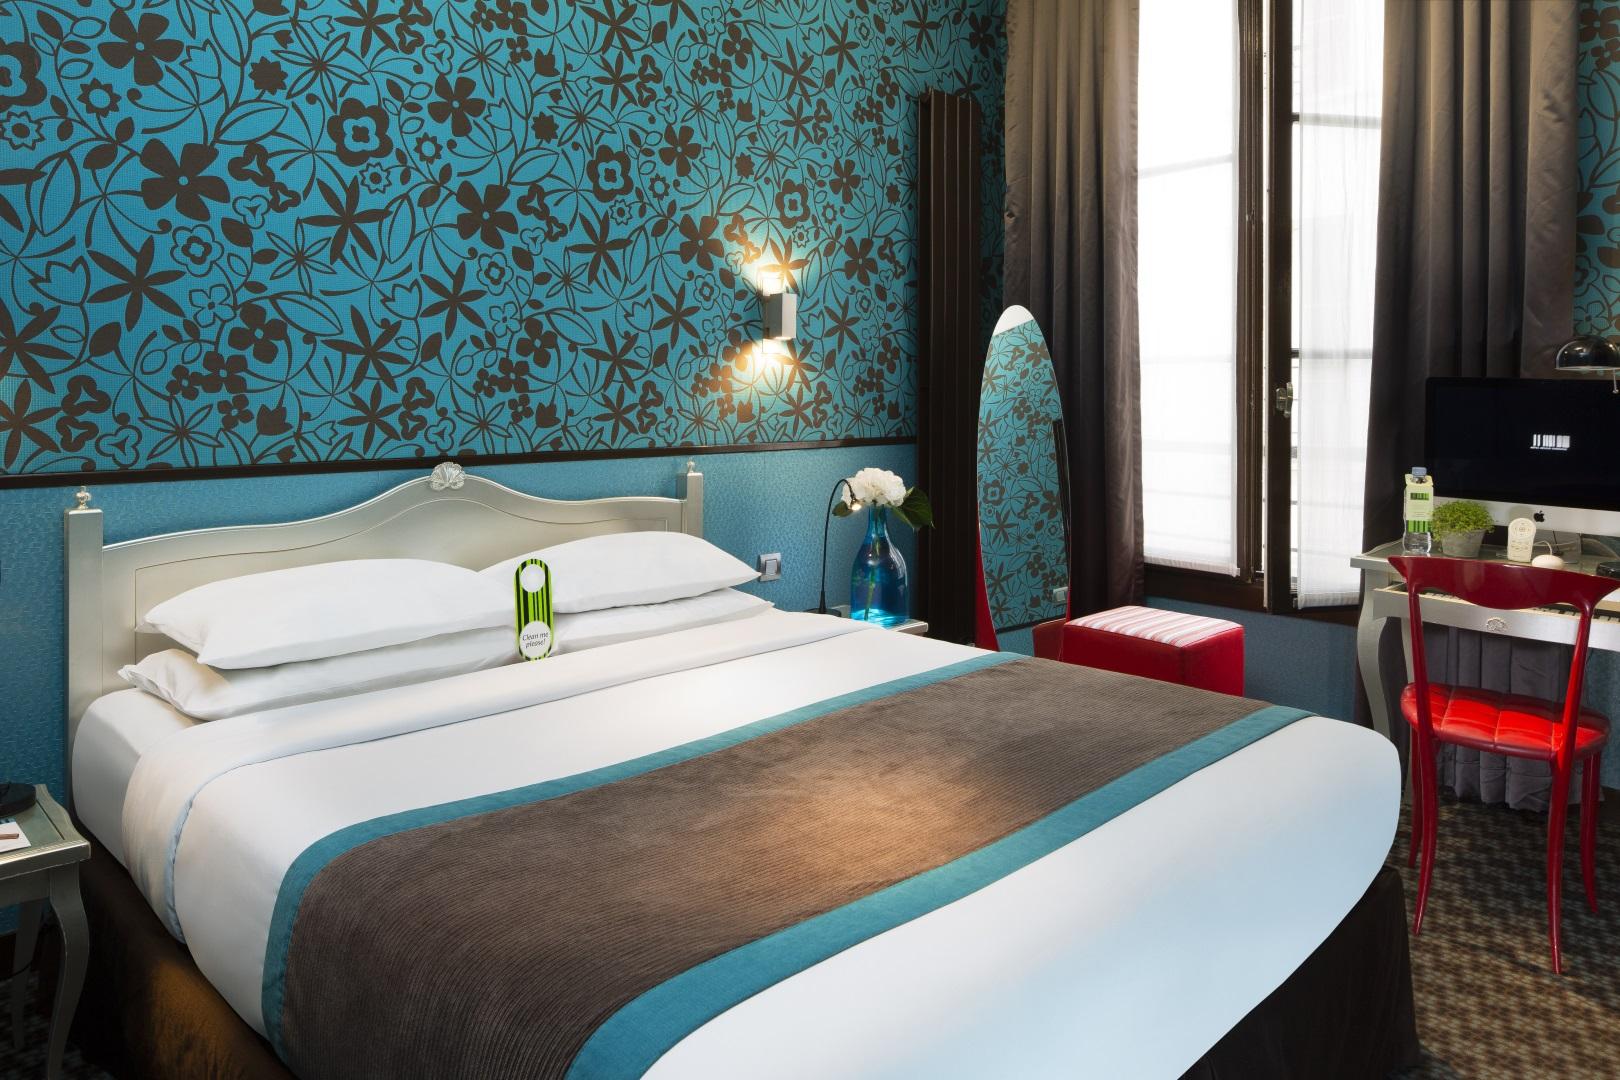 Hotel sorbonne paris design hotel in saint germain des for Hotel design paris 7